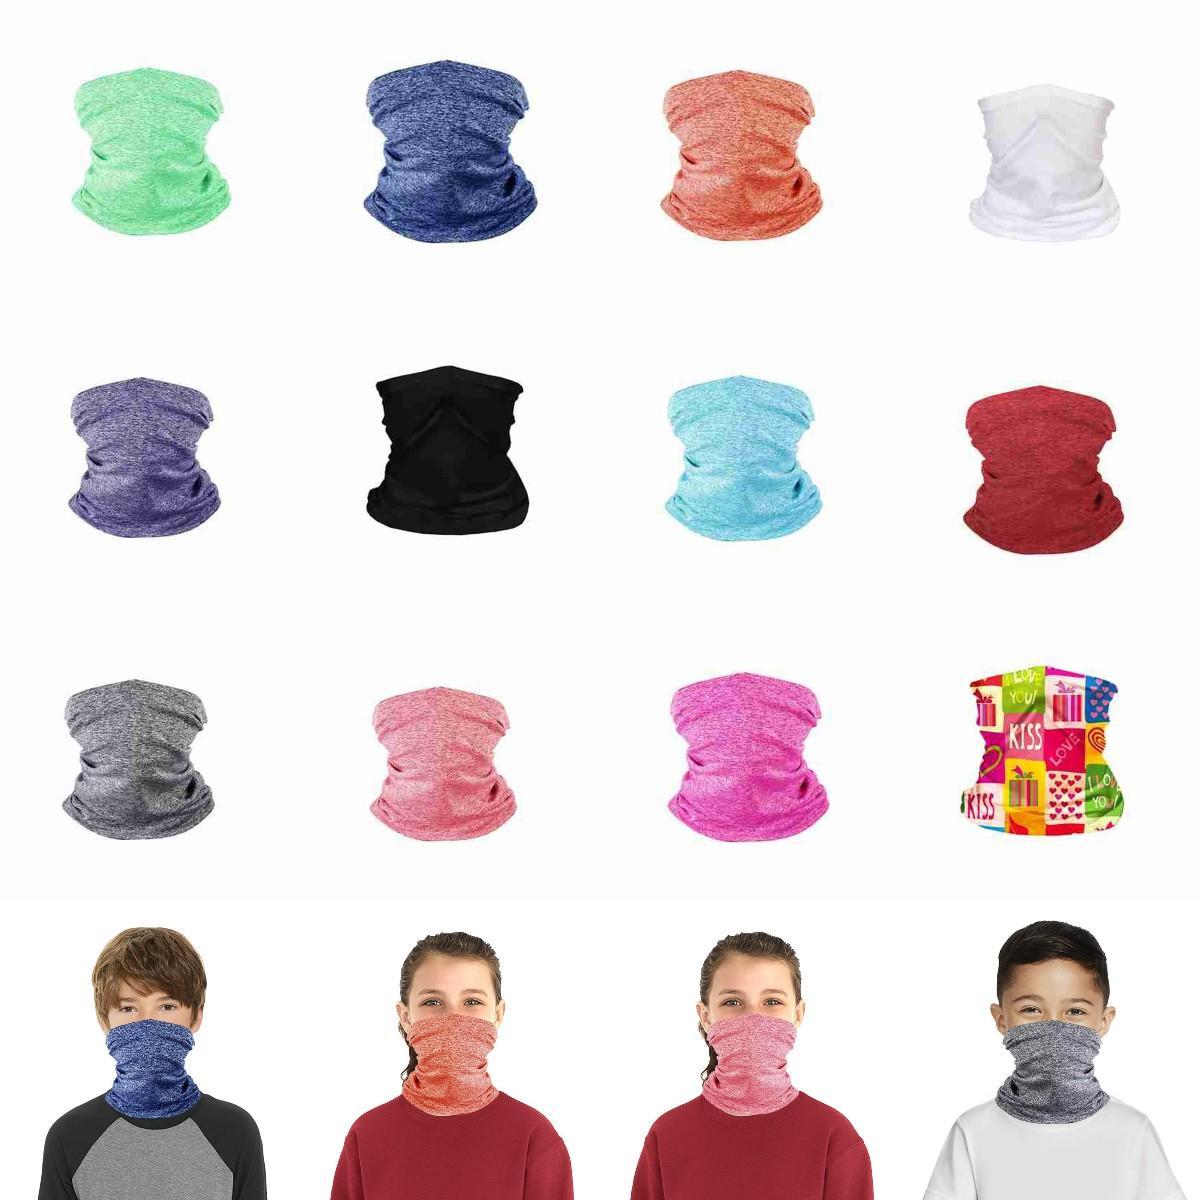 Riding Face Outdoor Face Kids Mask Mask Cycling Magic Turban Headband Bandanas Scarf Children Fitness CYZ2654 Supplies Masks Protective Rkjn